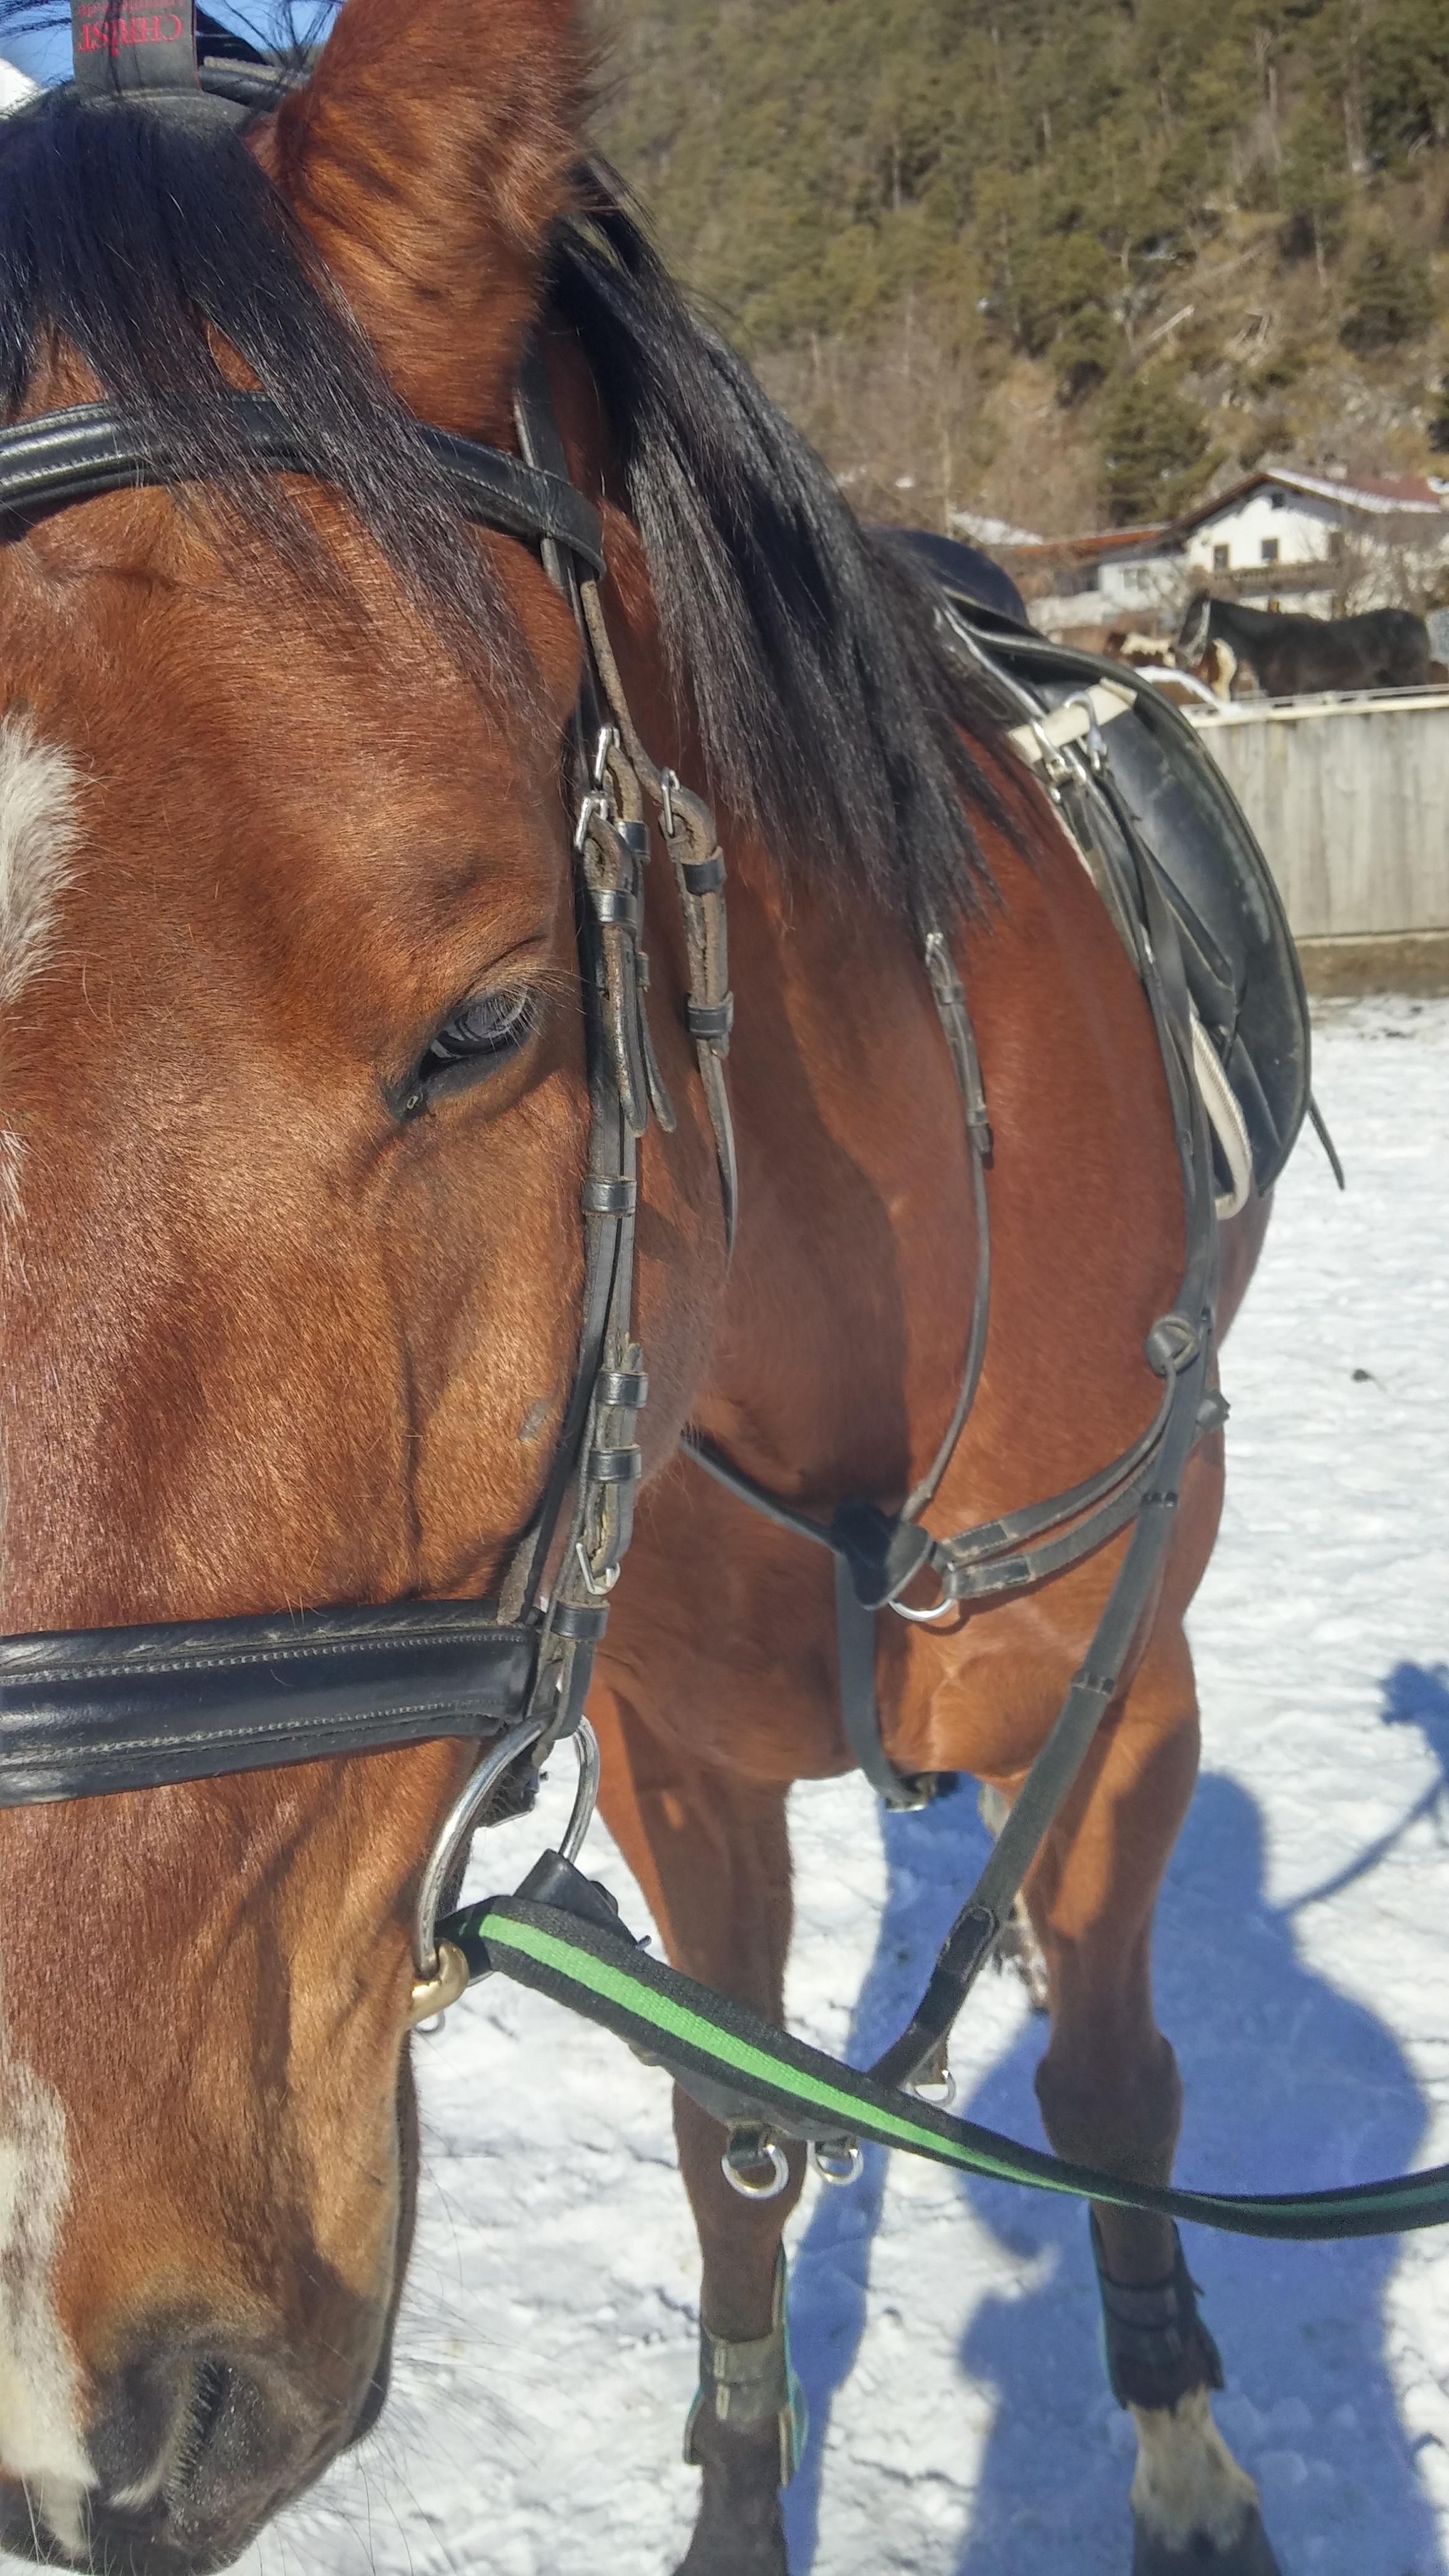 Free Images : fur, brown, rein, stallion, mane, bridle, saddle, mare